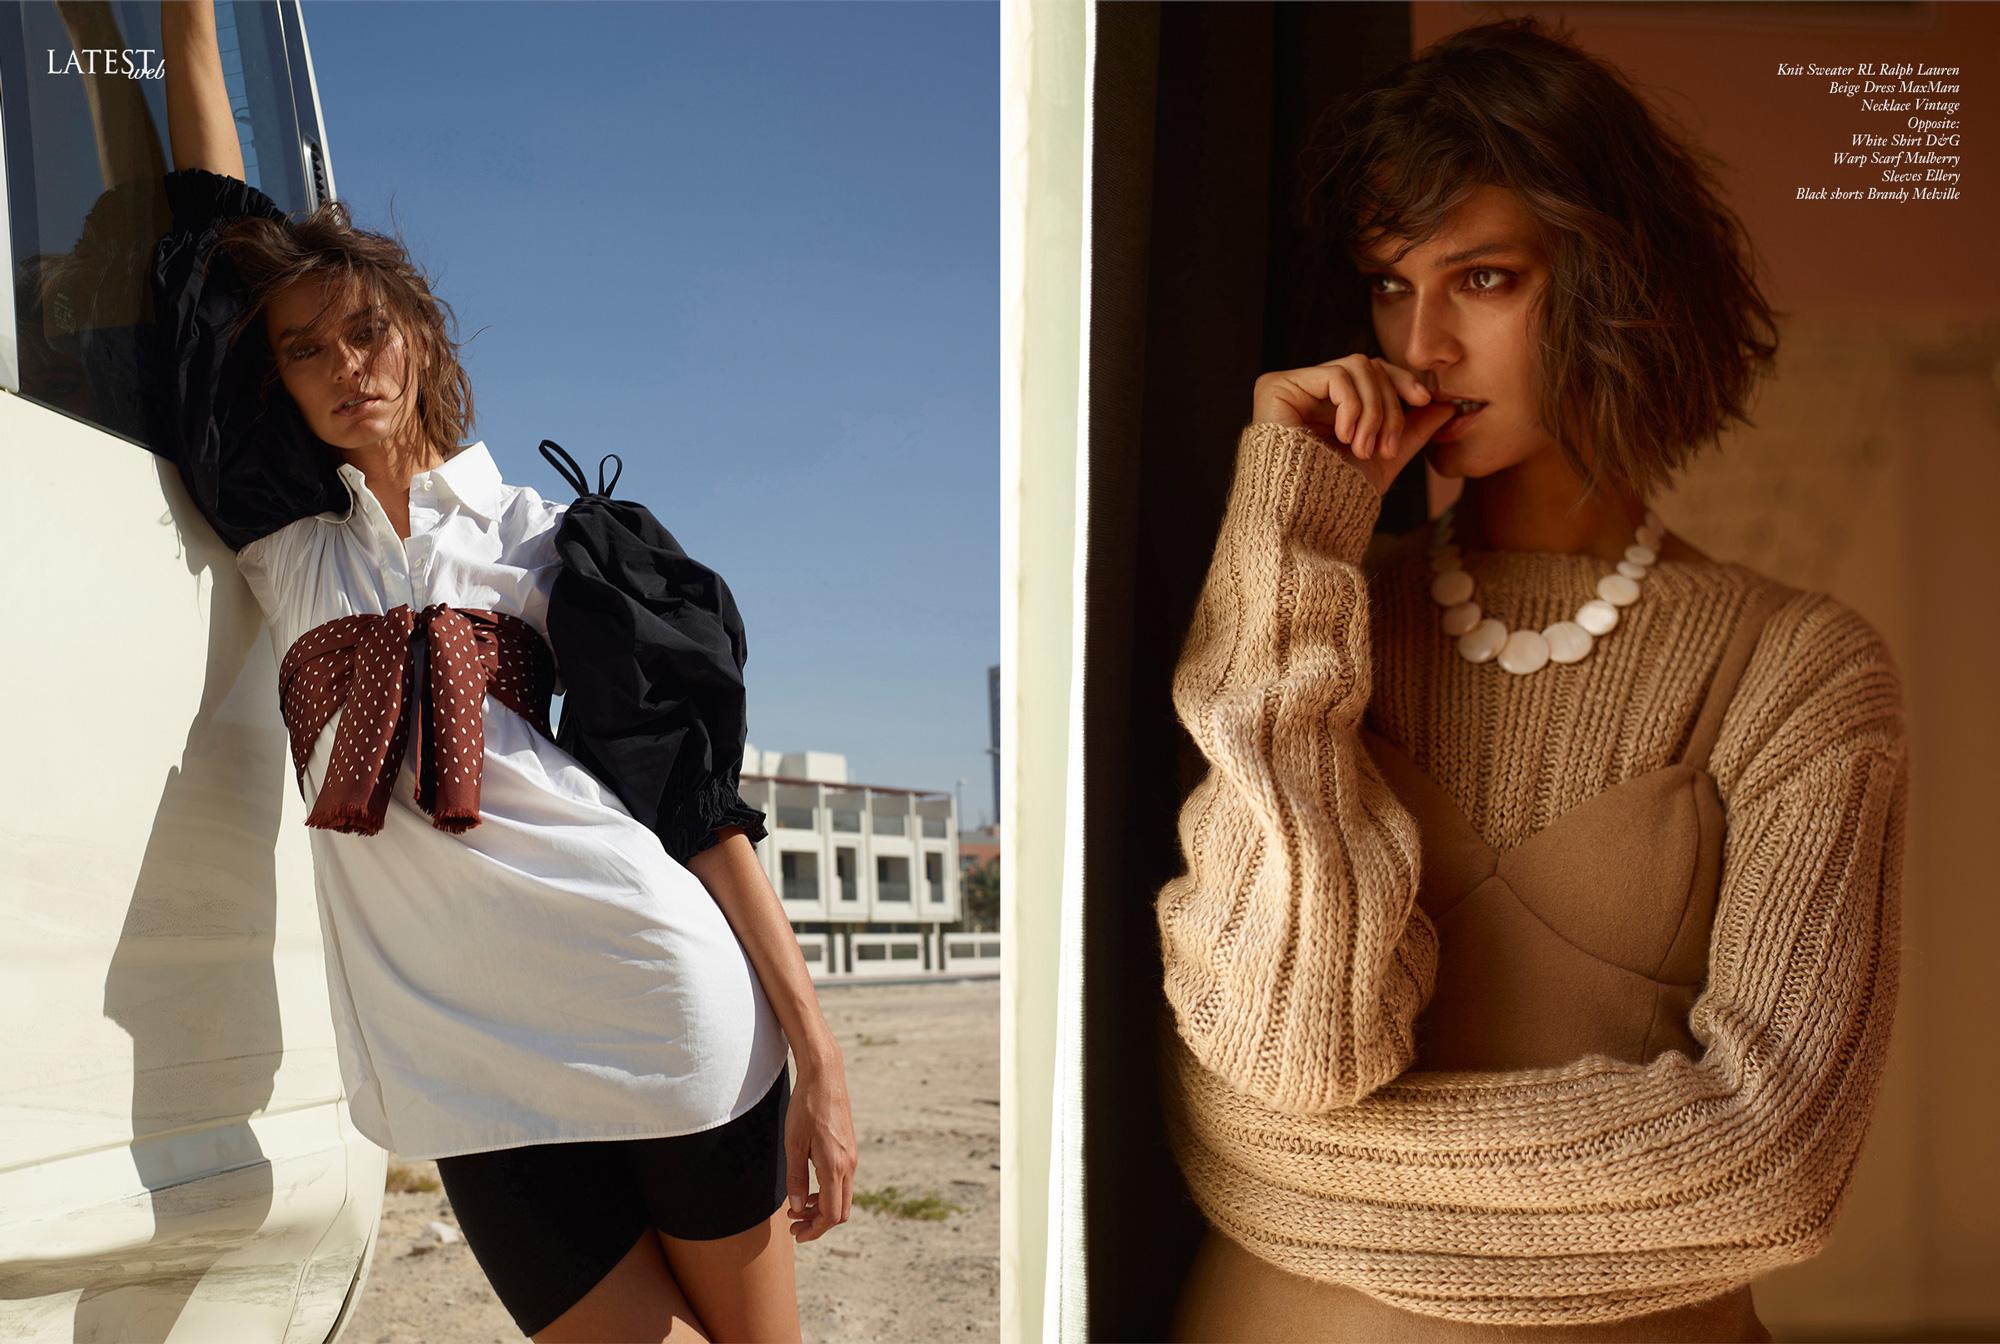 Memories, Klaudia Zdanowicz in Dubai editorial for Latest magazine. By Ioannis Koussertari